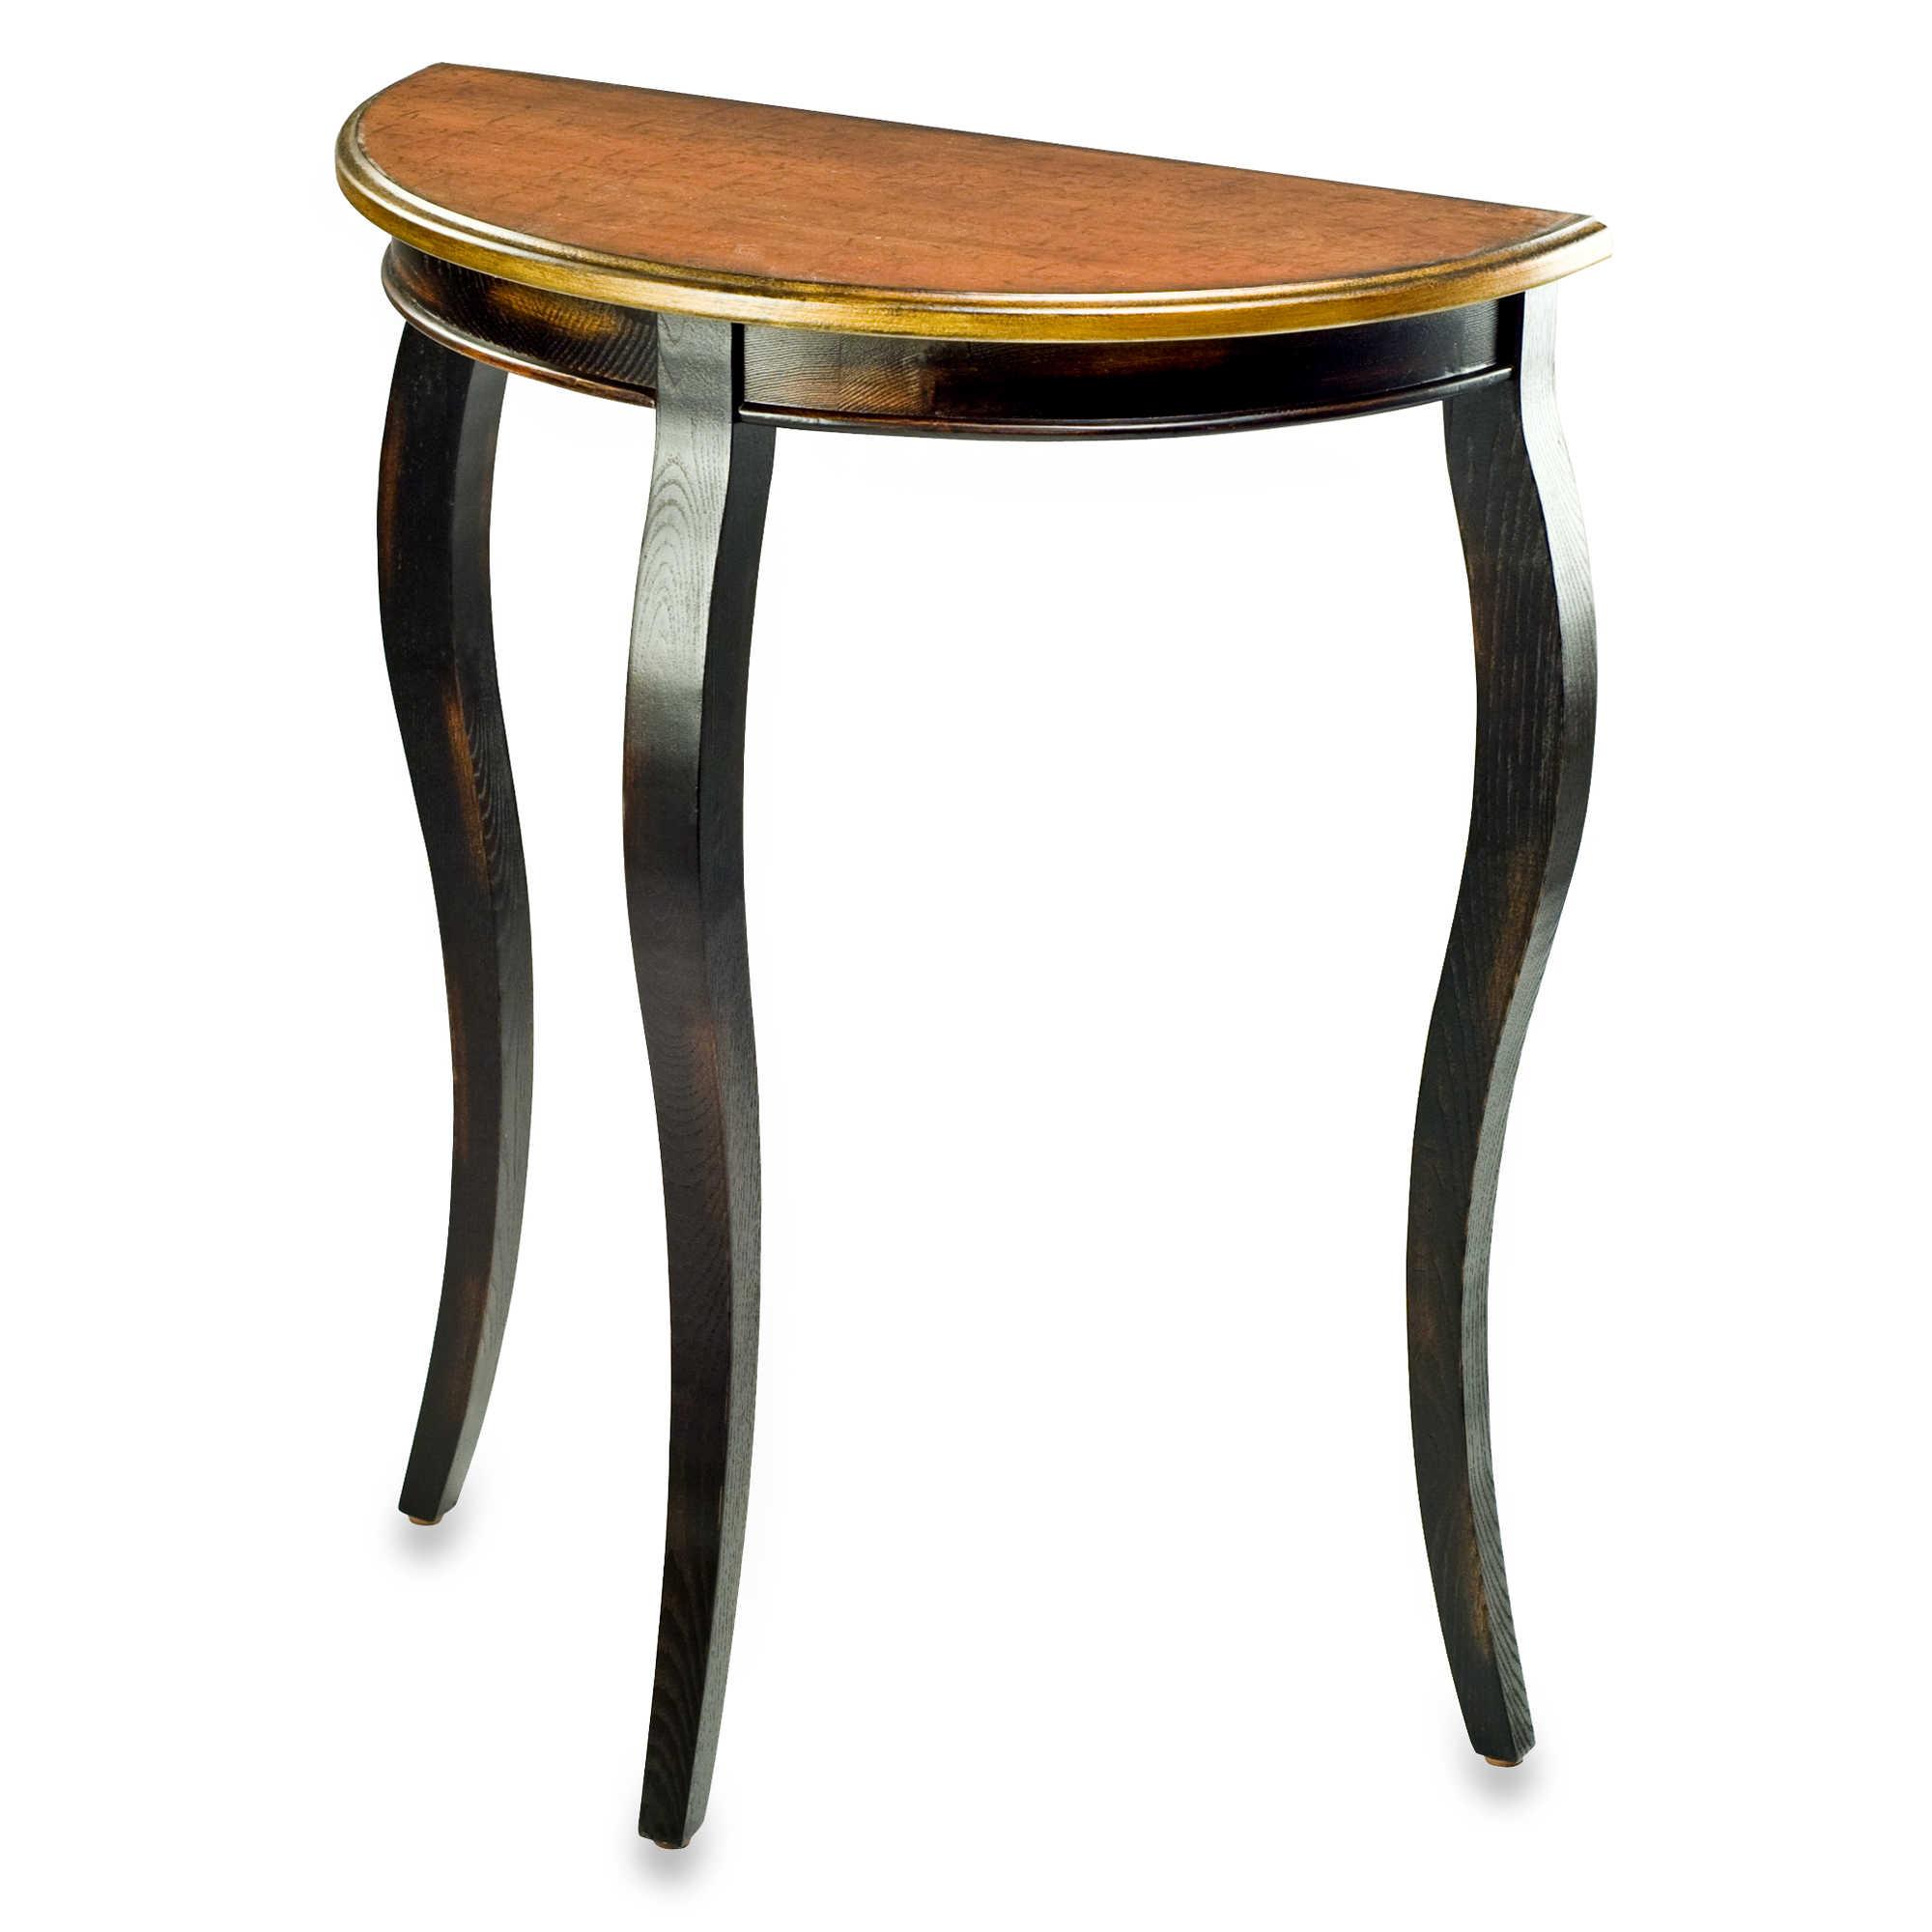 Stylish Halfmoon Table With Wooden Style